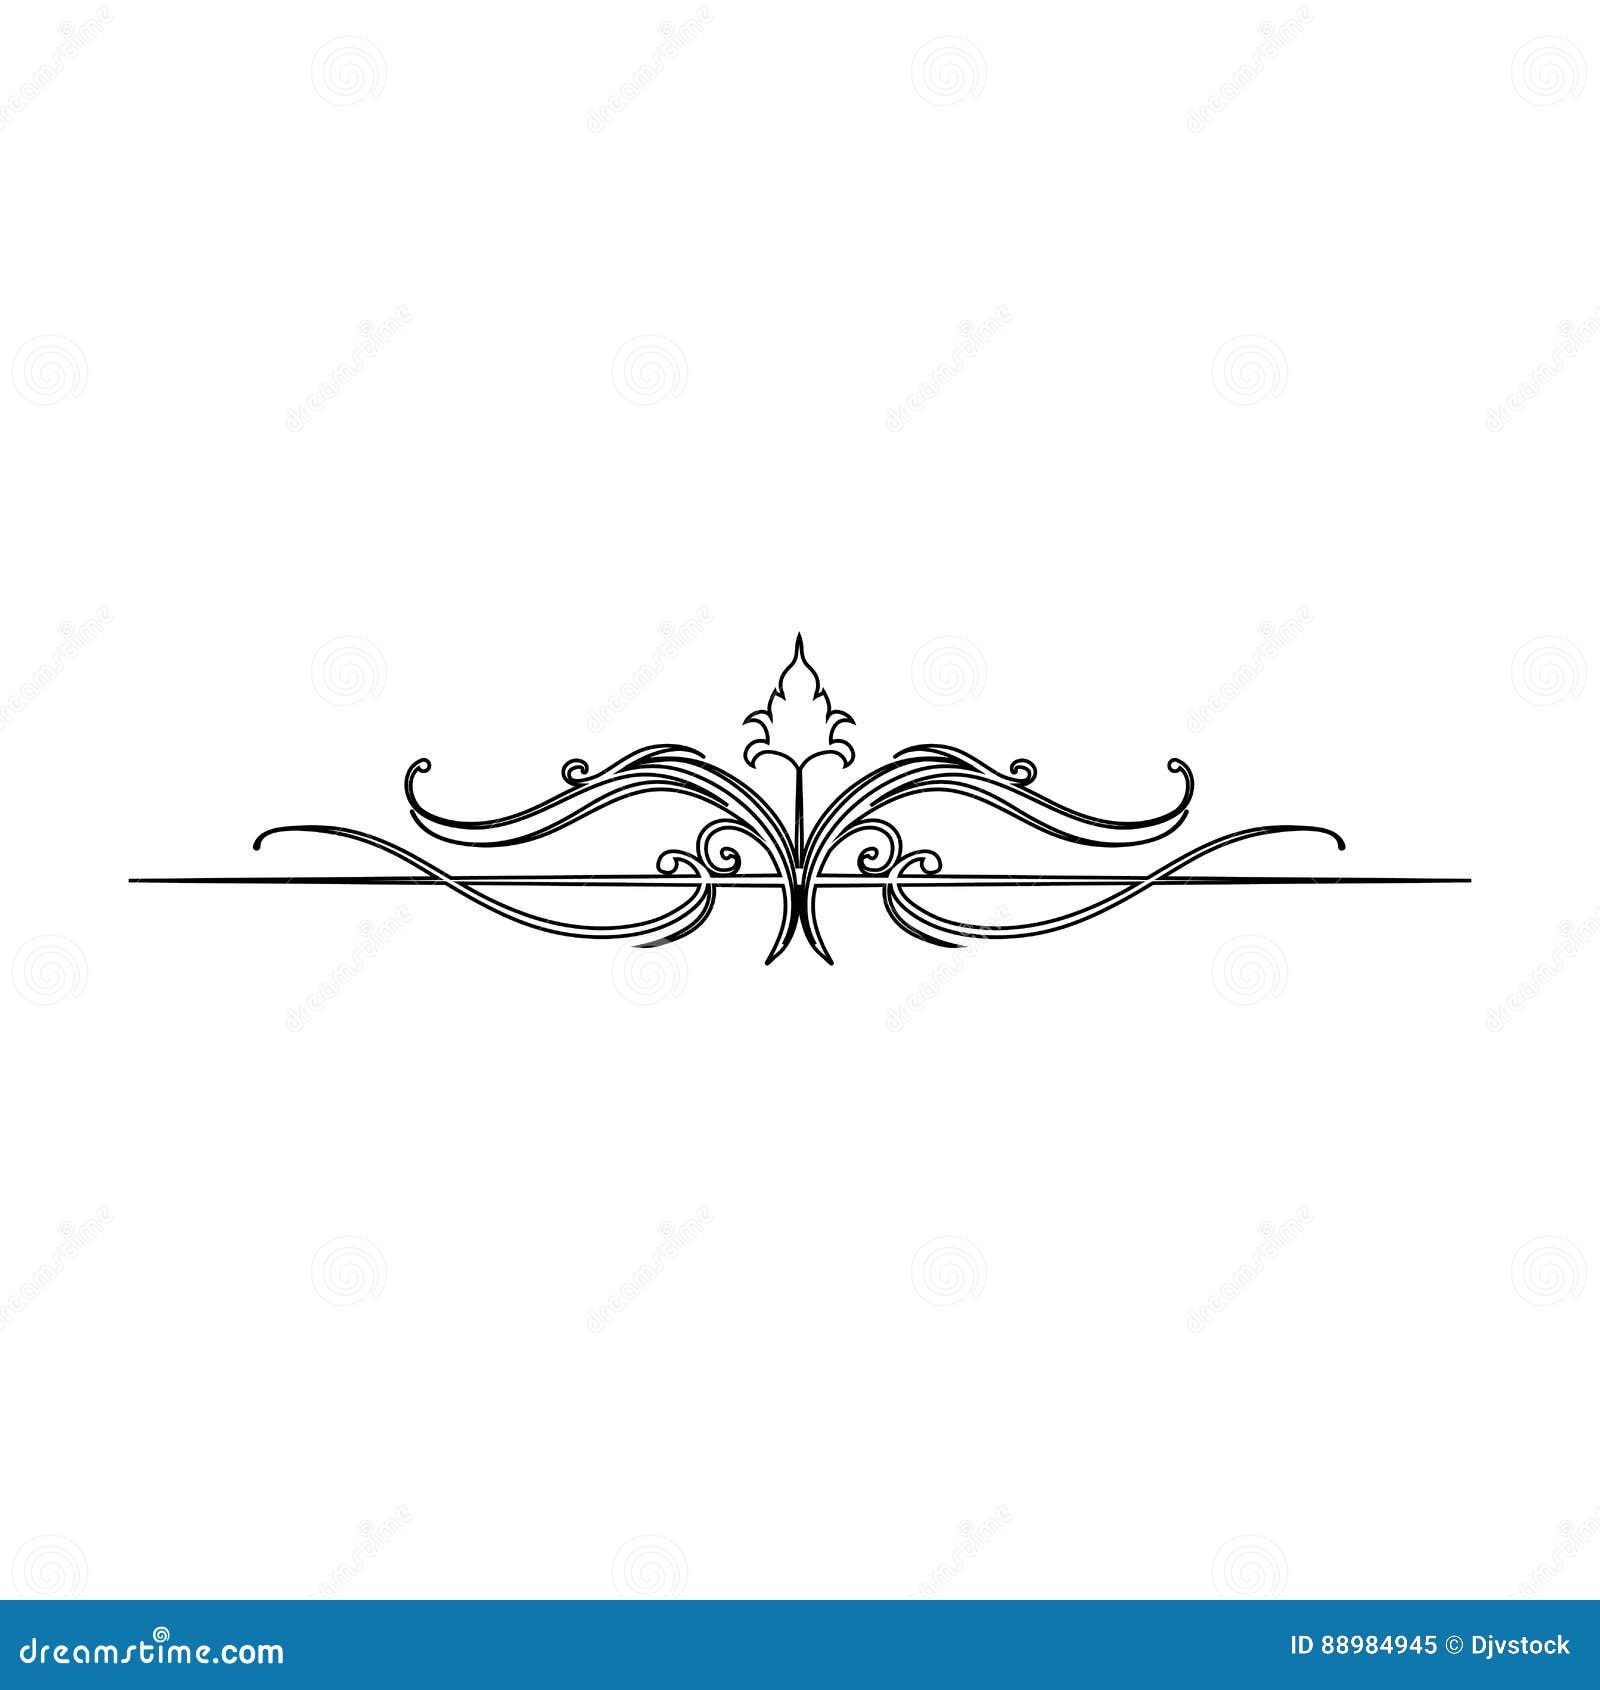 swirl decorative lines stock illustration illustration of graphic